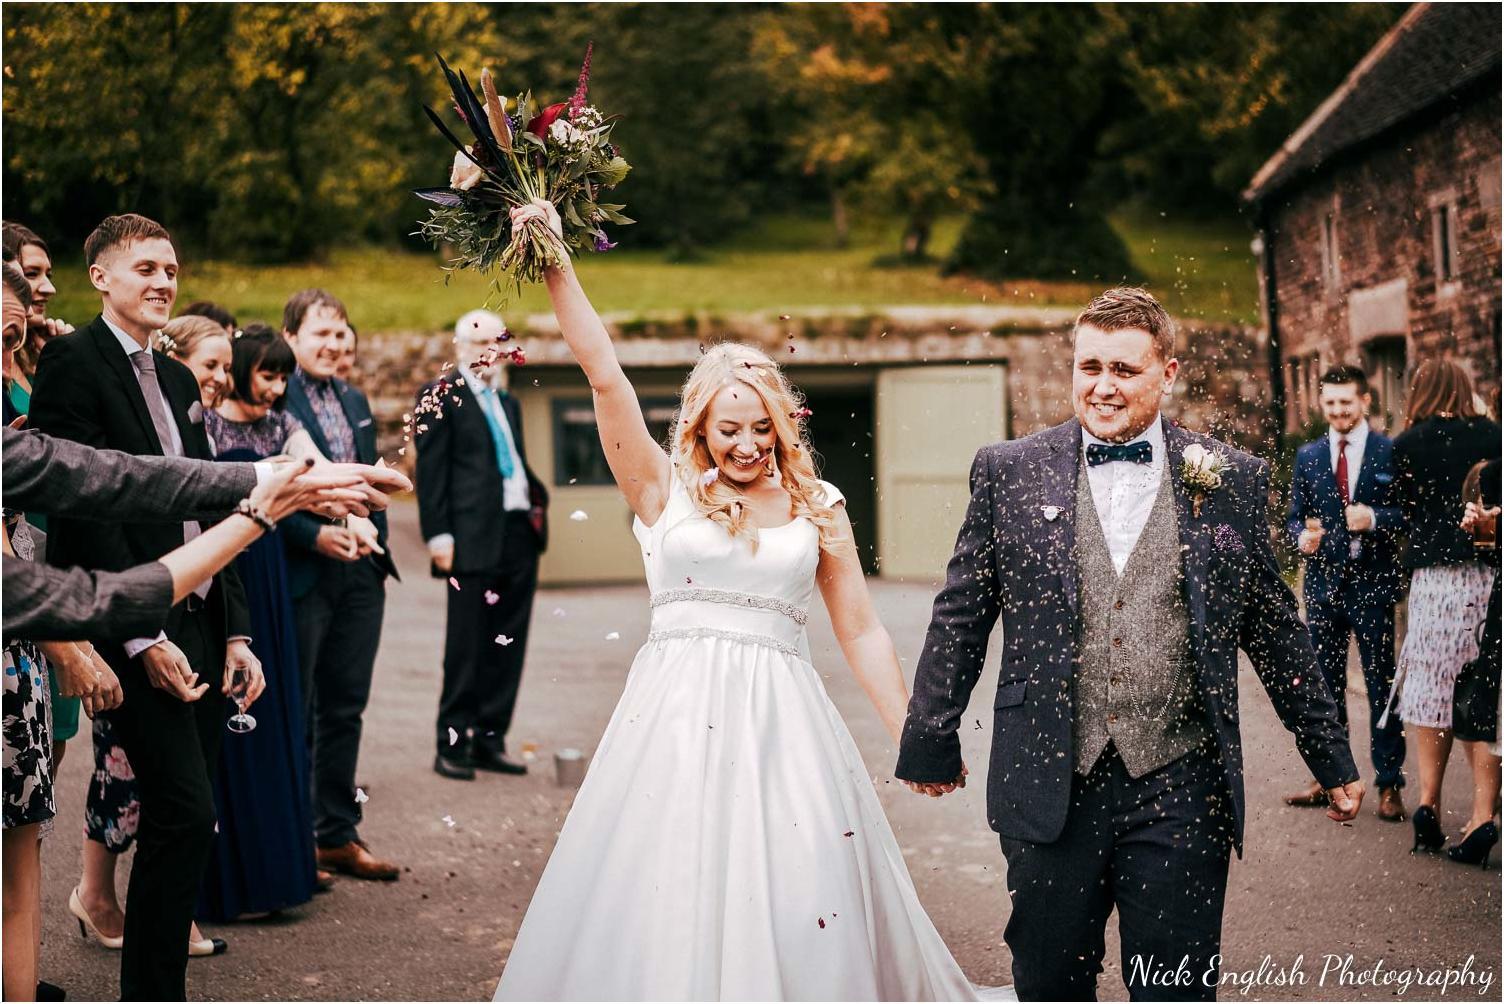 The_Ashes_Barn_Endon_Stoke_Wedding_Photographer-57.jpg